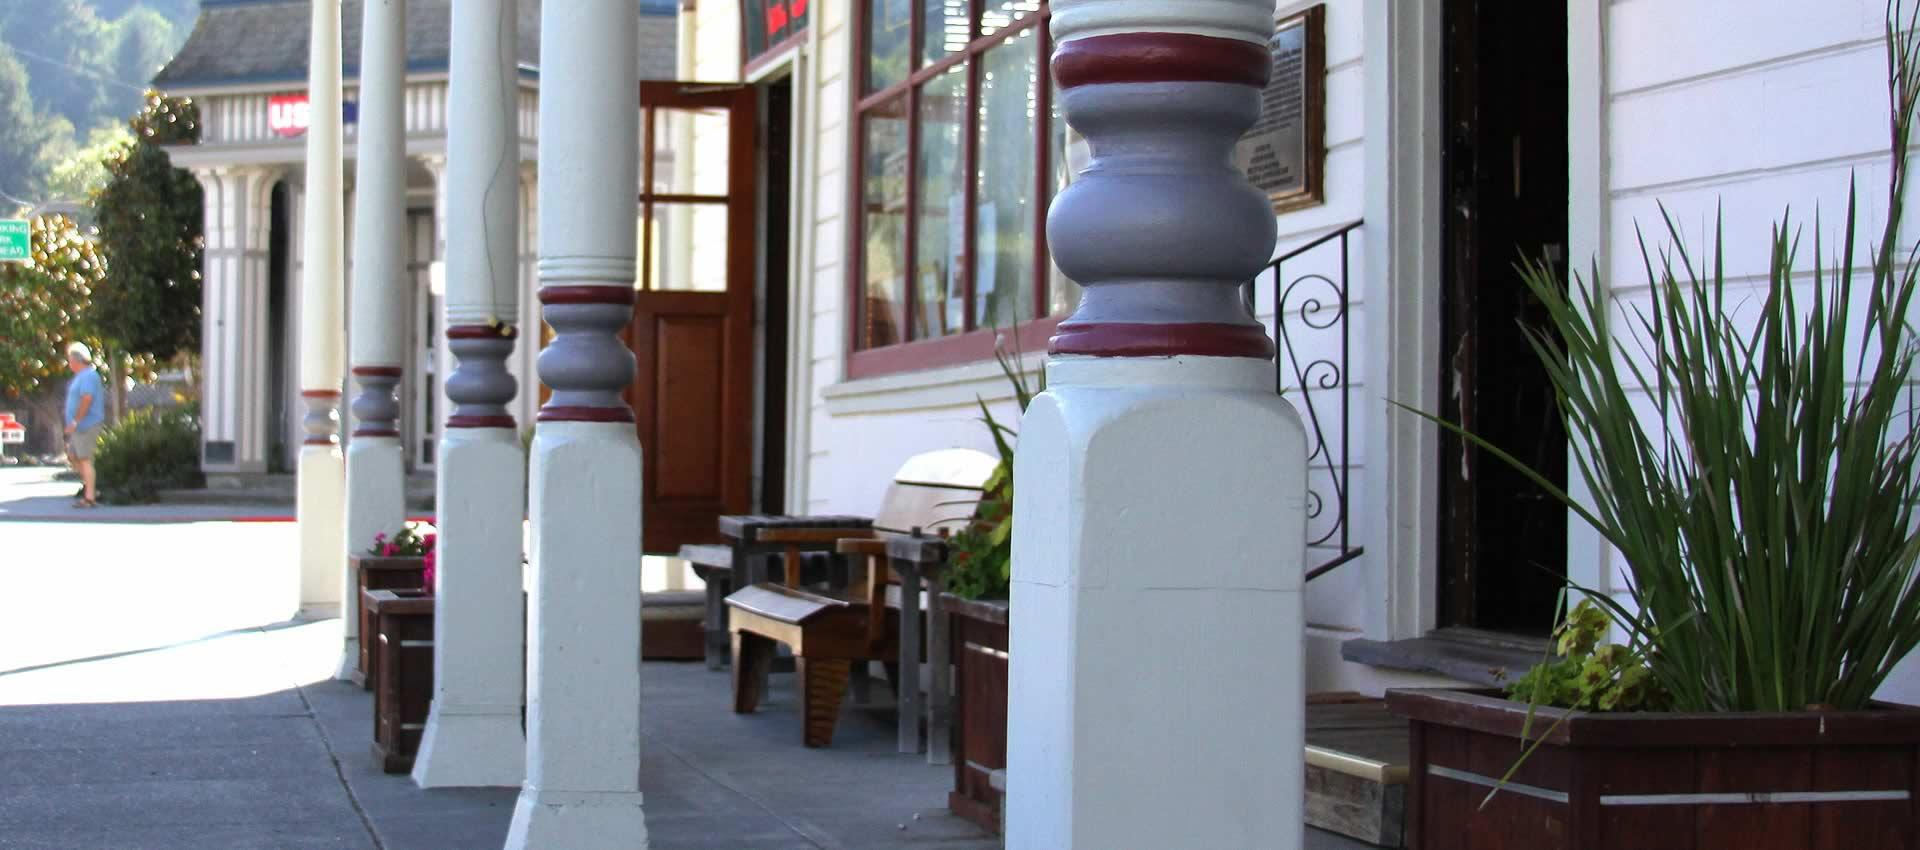 redwood-suites-street